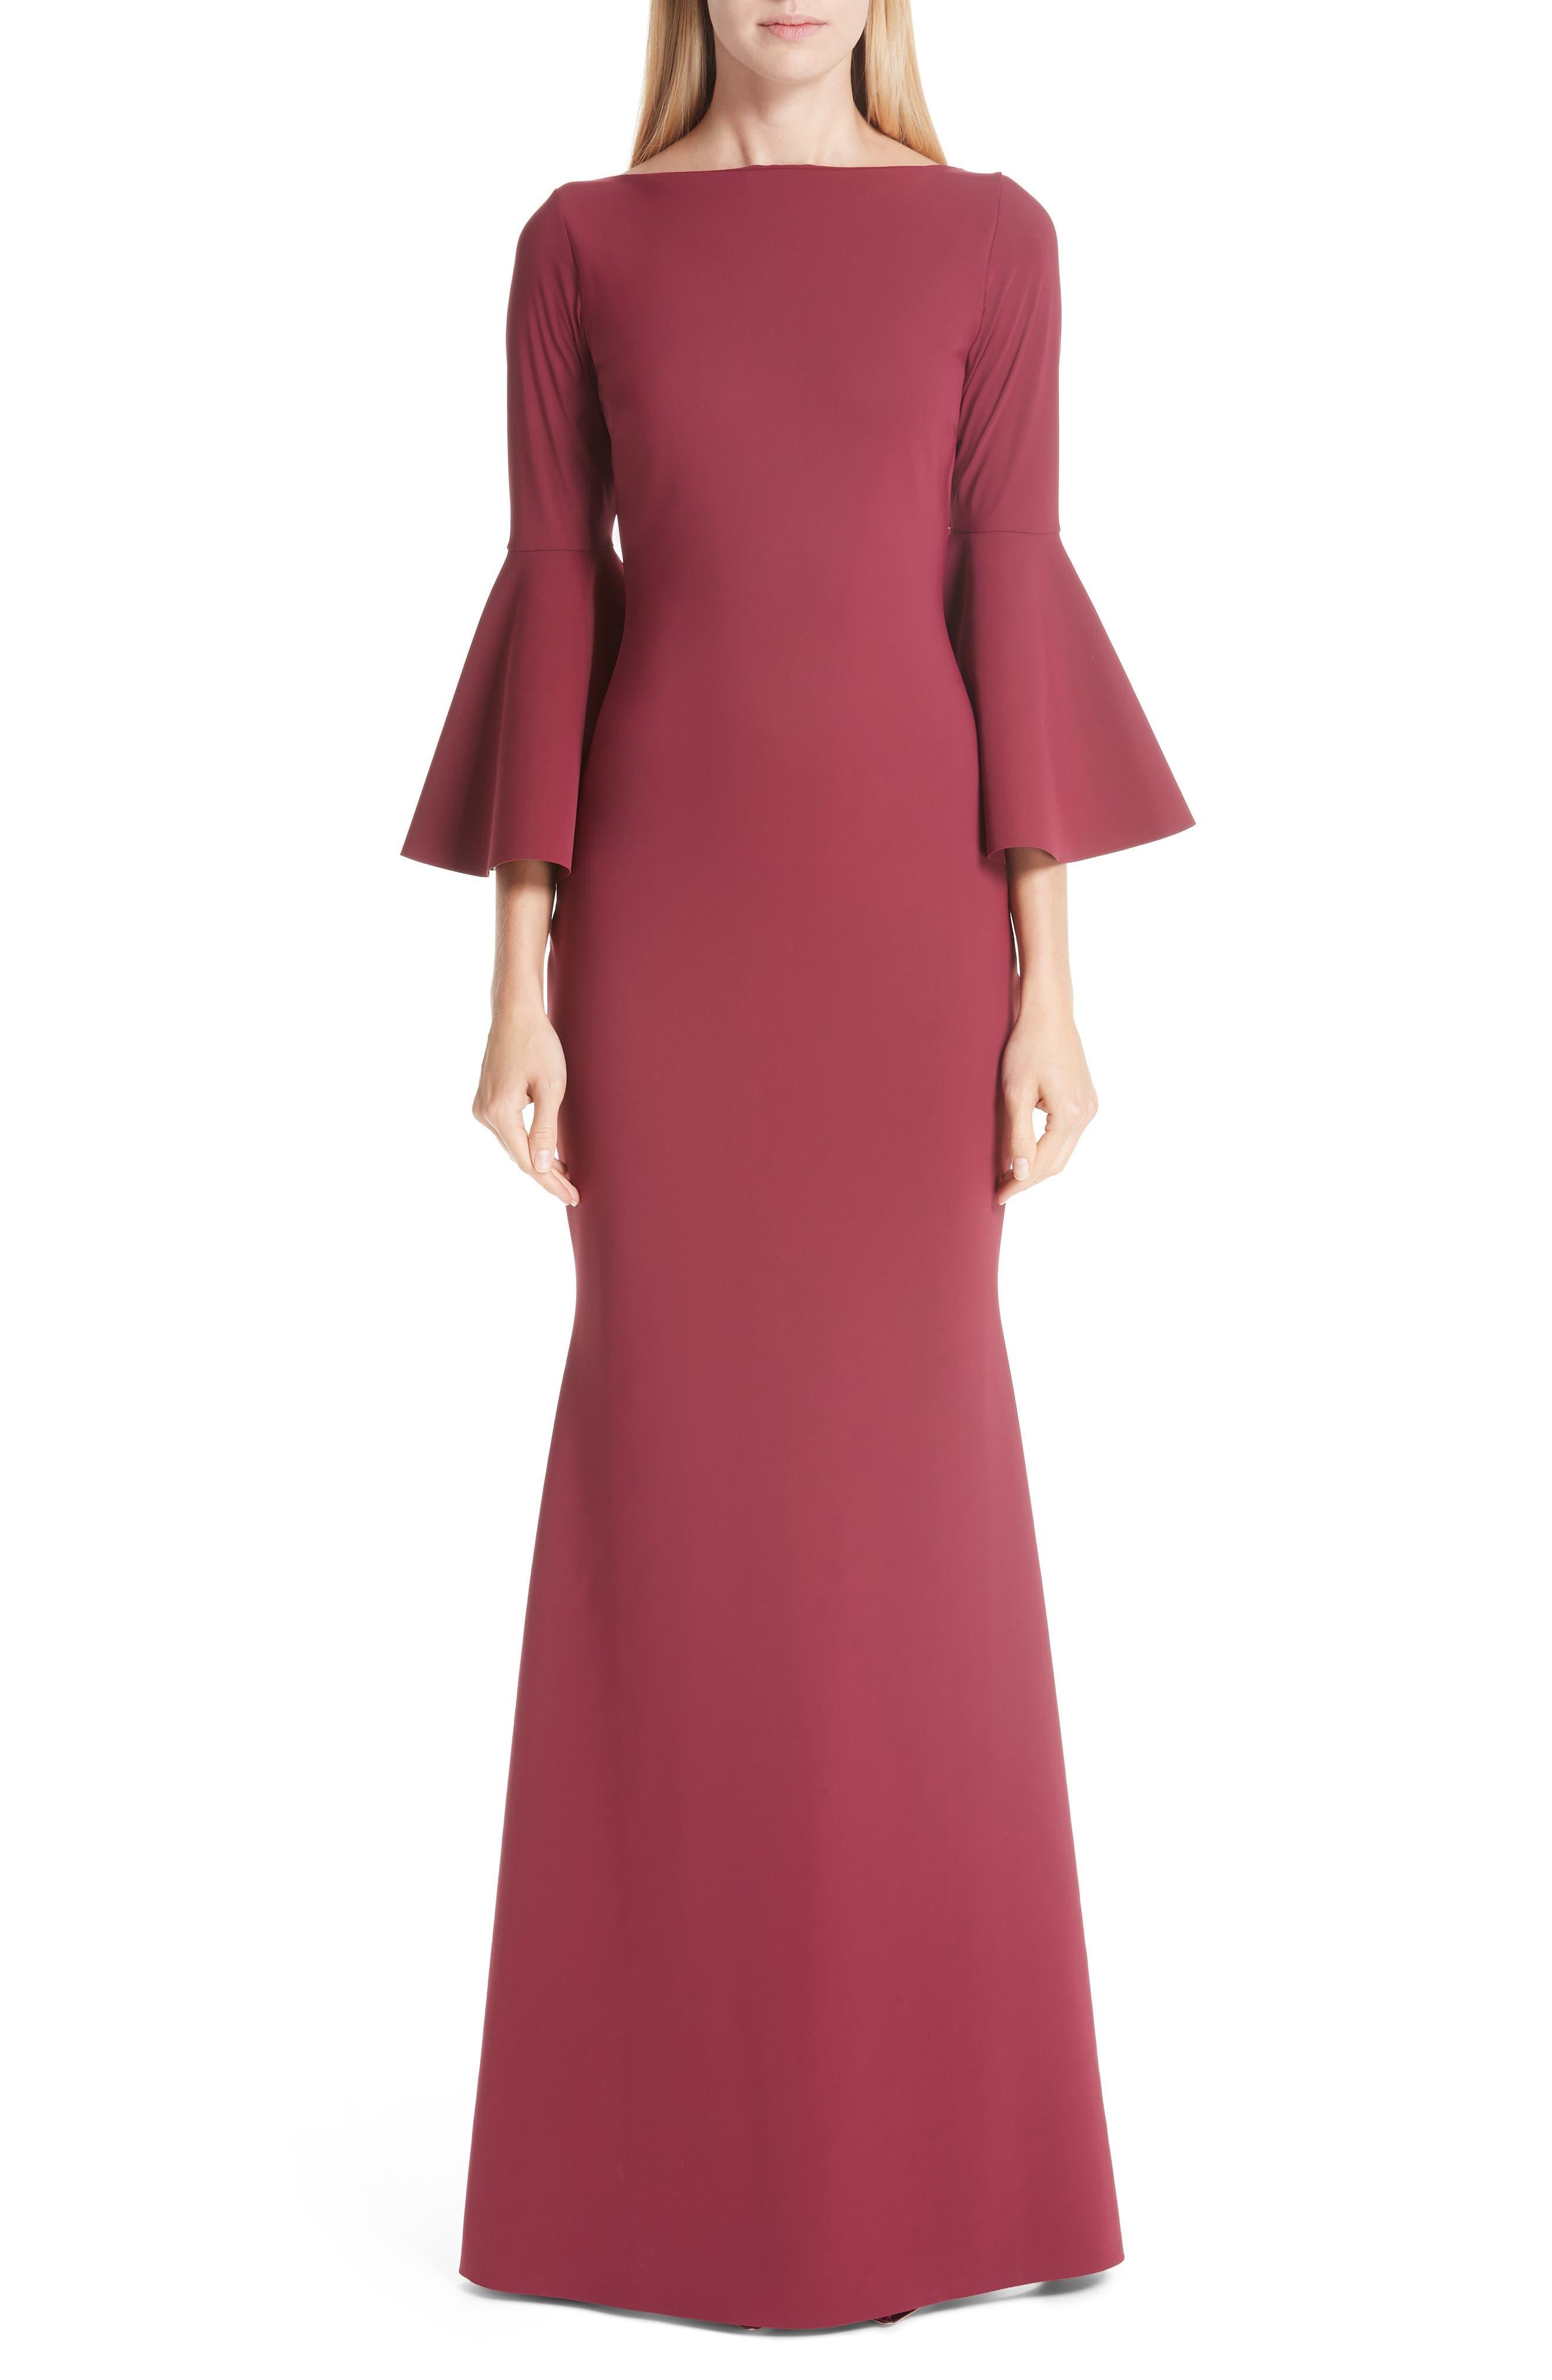 Chiara Boni La Petite Robe Iva Bell Sleeve Evening Dress, 8 IT - Red